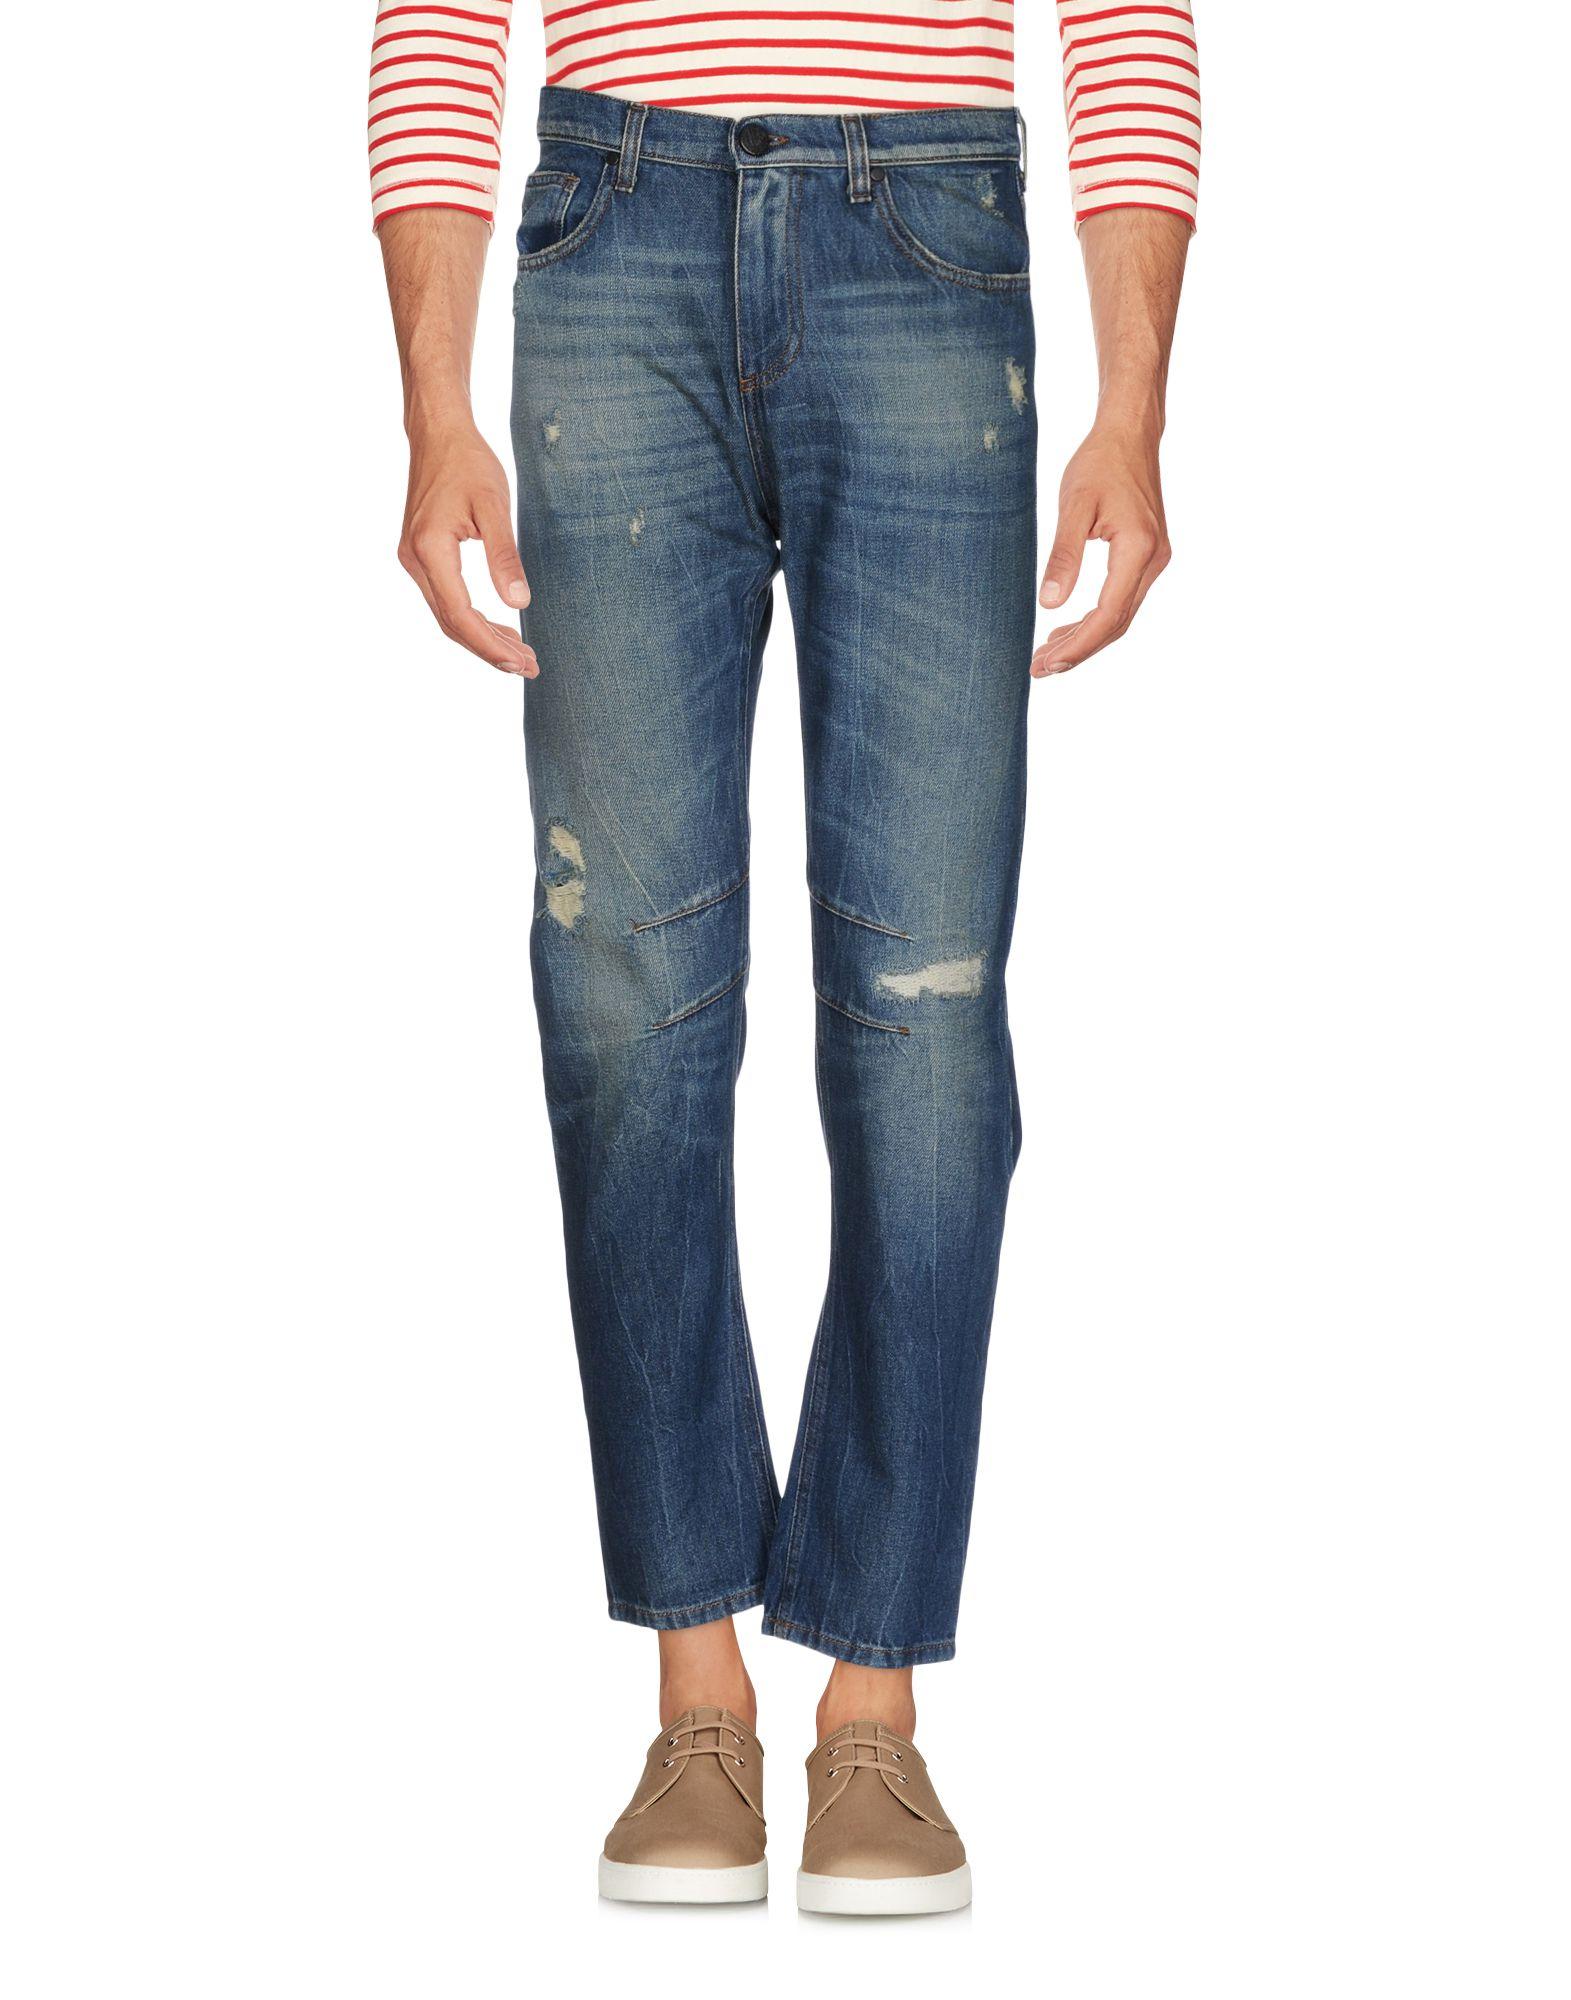 Pantaloni Jeans Versace Jeans Uomo - Acquista online su